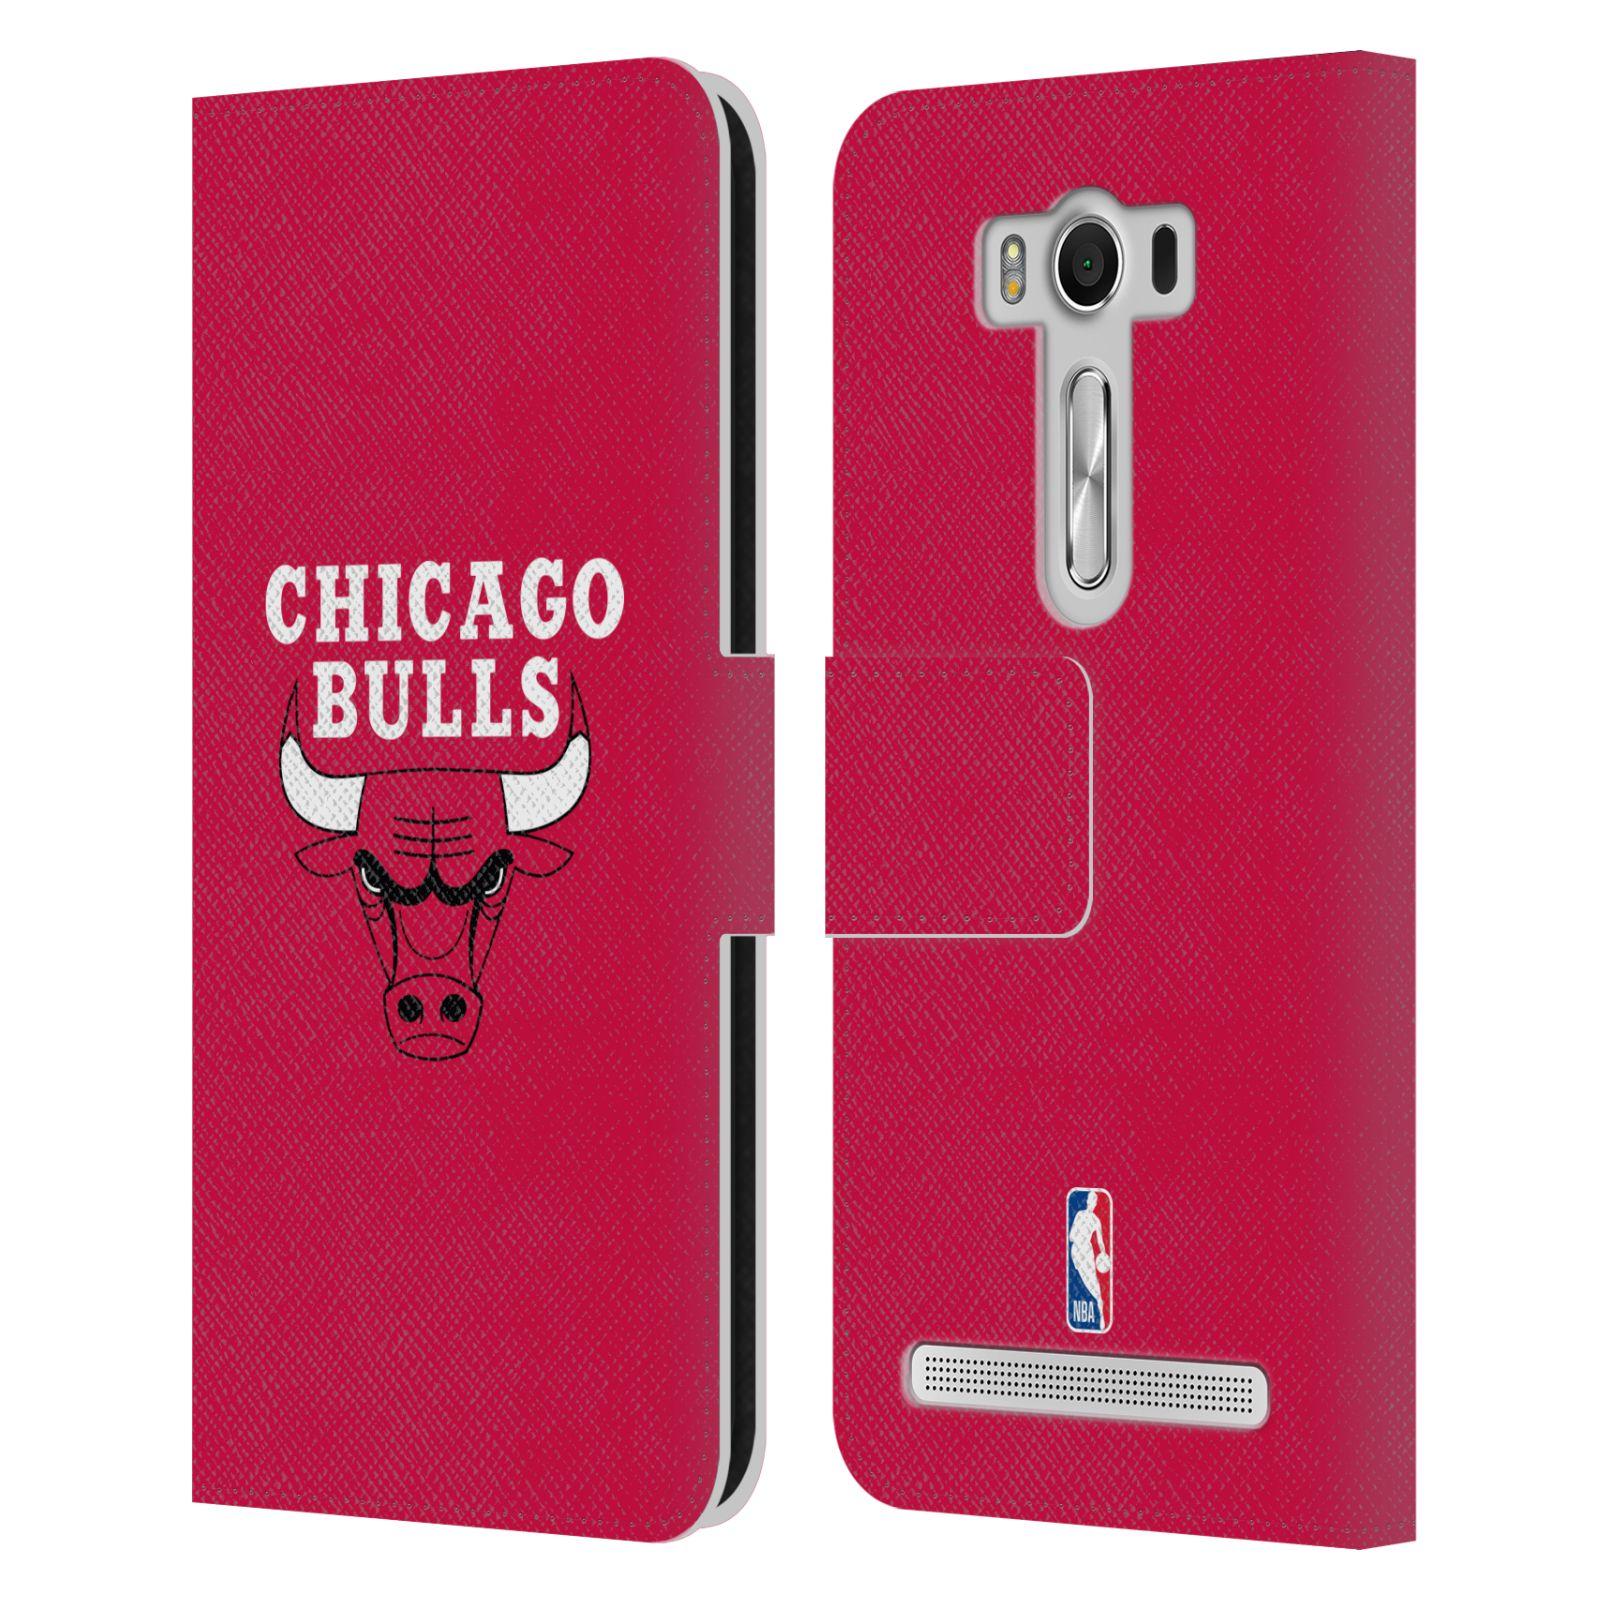 Pouzdro na mobil Asus Zenfone 2 Laser ZE500KL - Head Case -NBA - Chicago Bulls červená barva znak